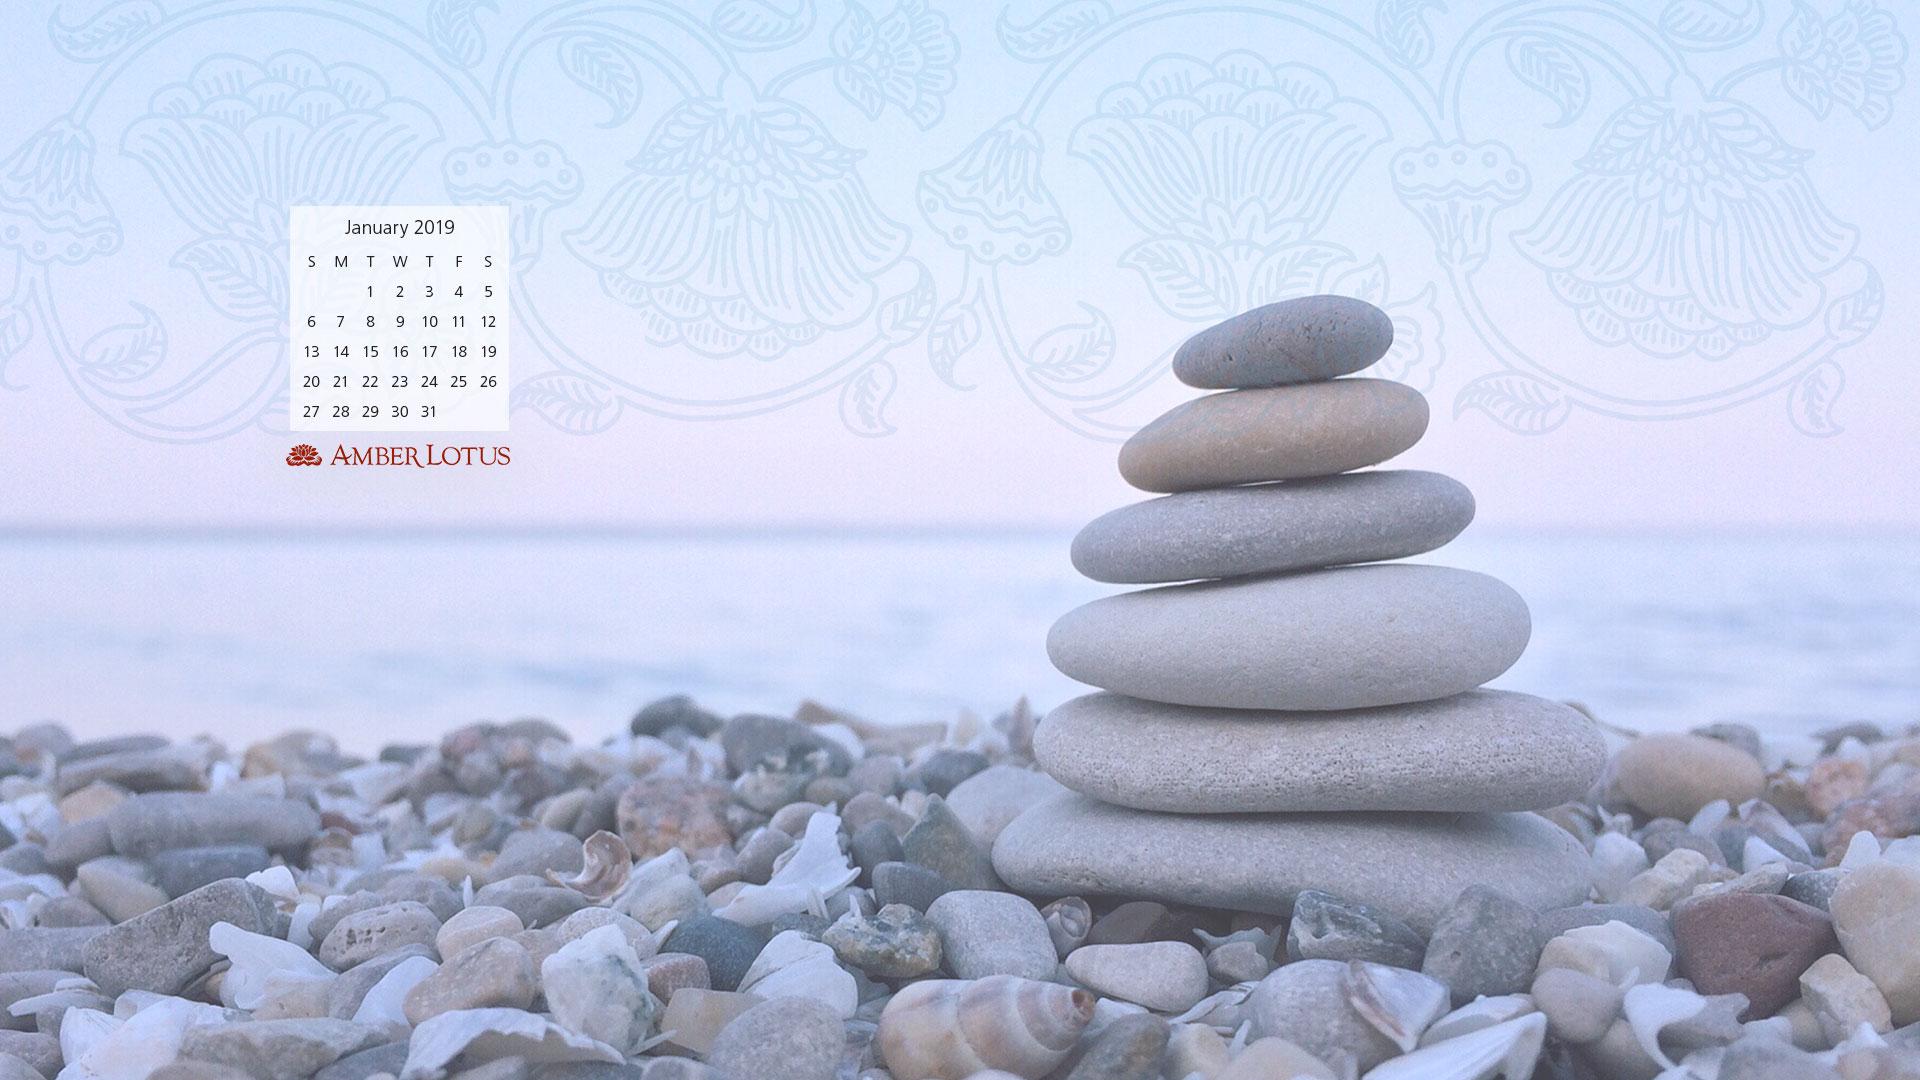 Desktop Wallpaper Calendar January 2019 to Download 1920x1080